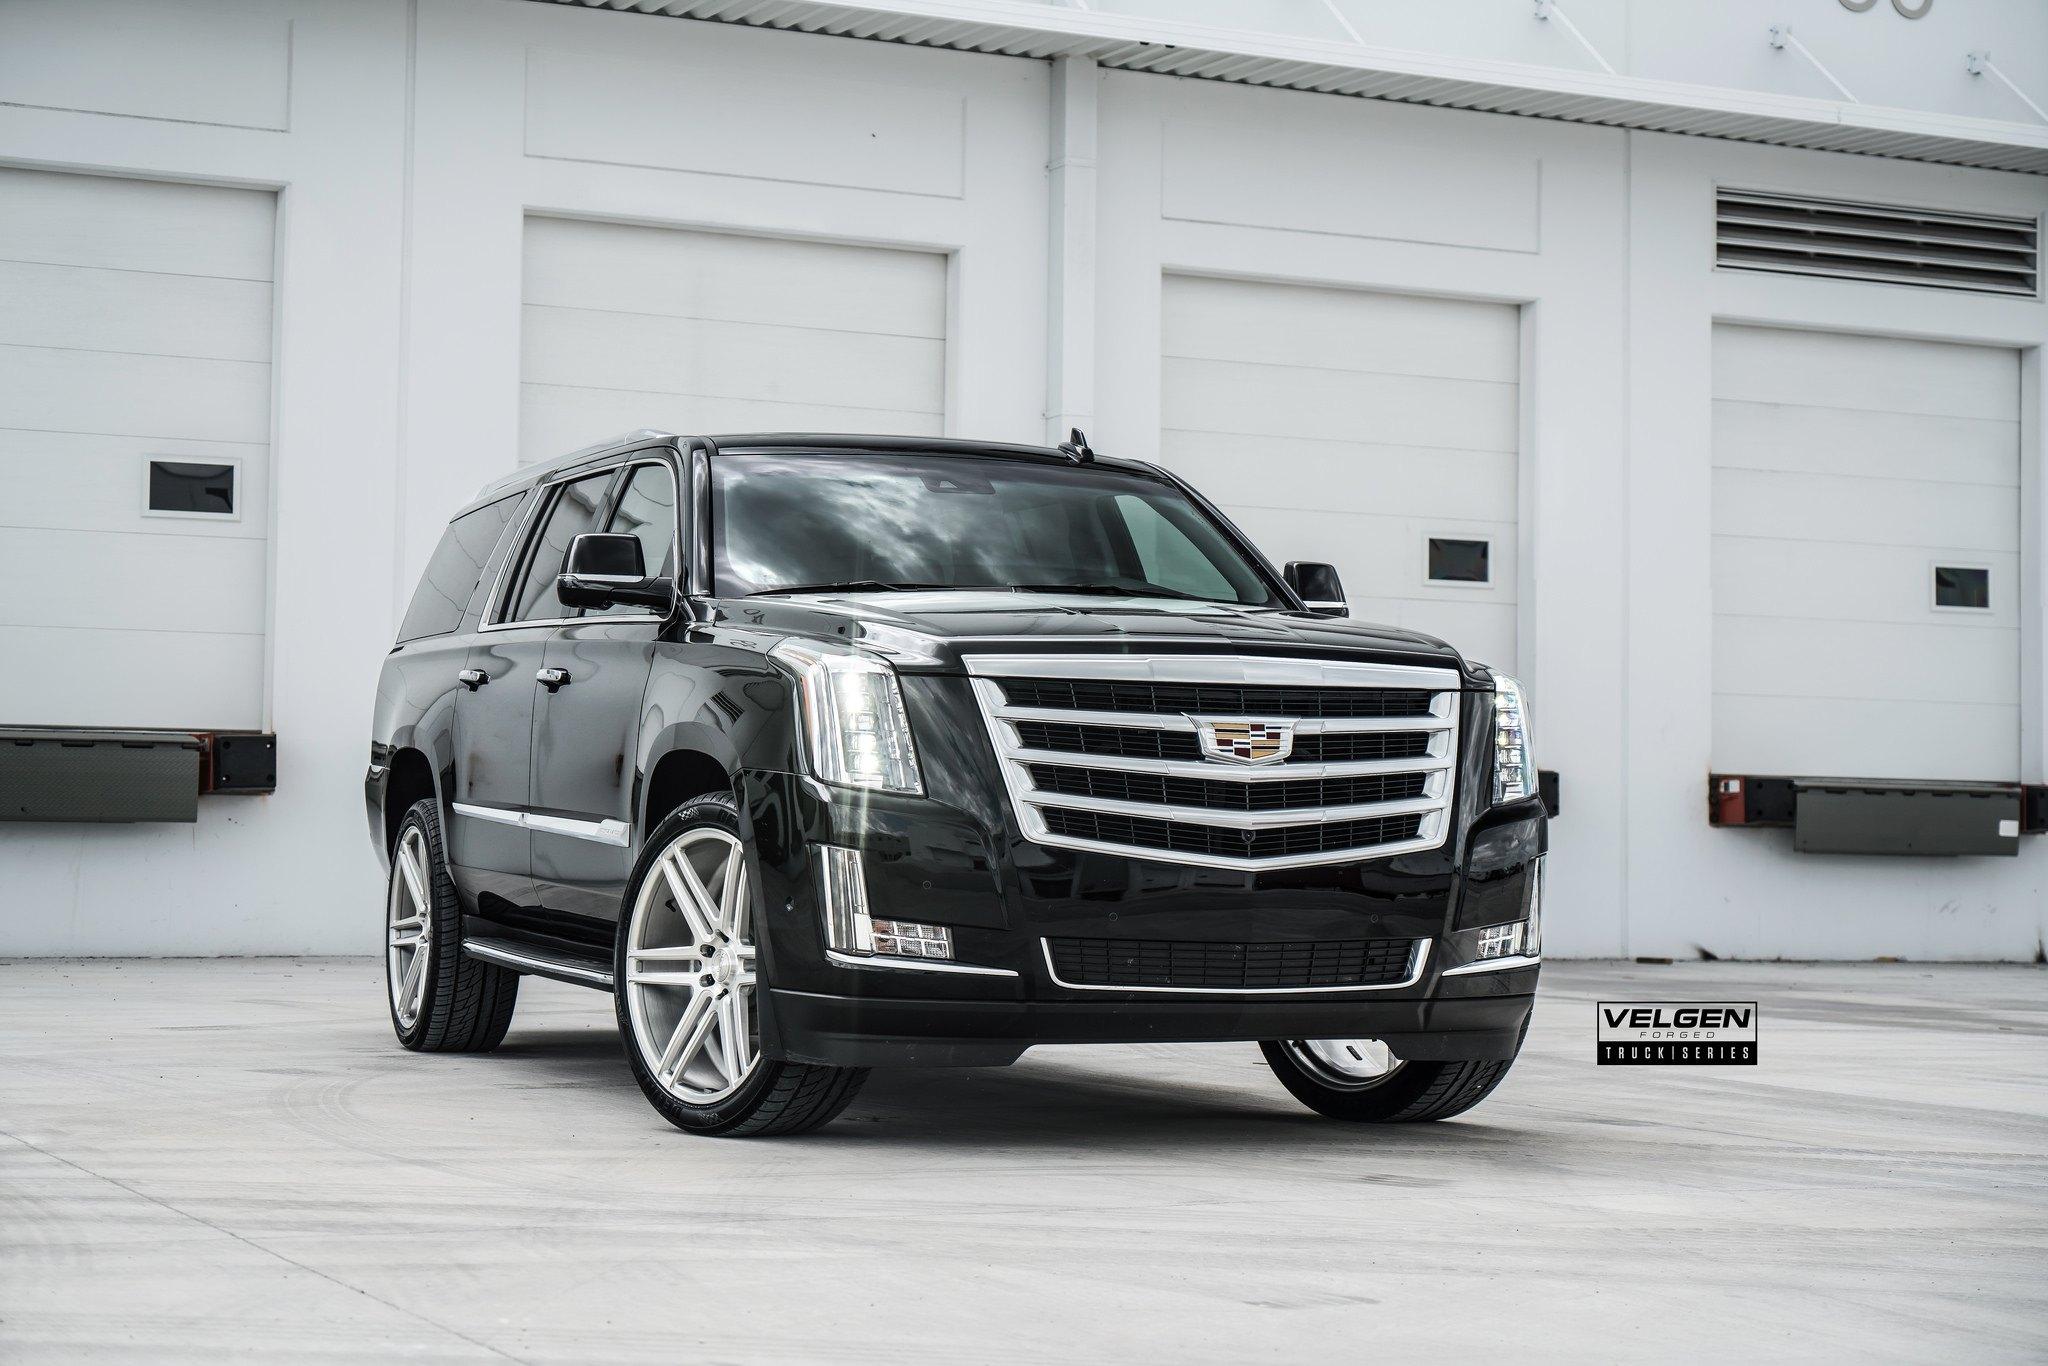 Custom cadillac escalade images mods photos upgrades - Cadillac cts interior accessories ...